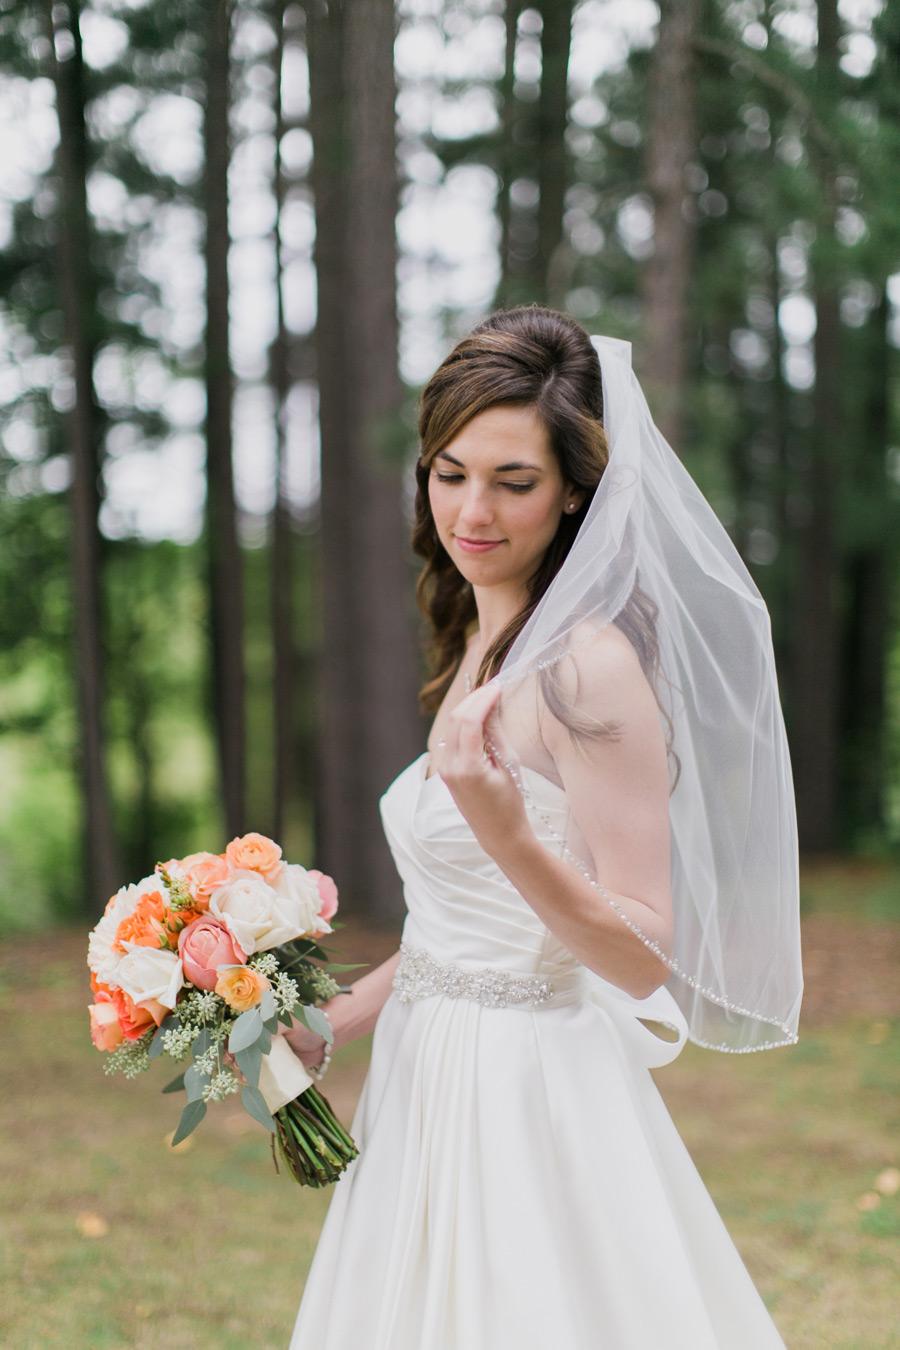 northwoods-wisconsin-wedding-discovery-center-009